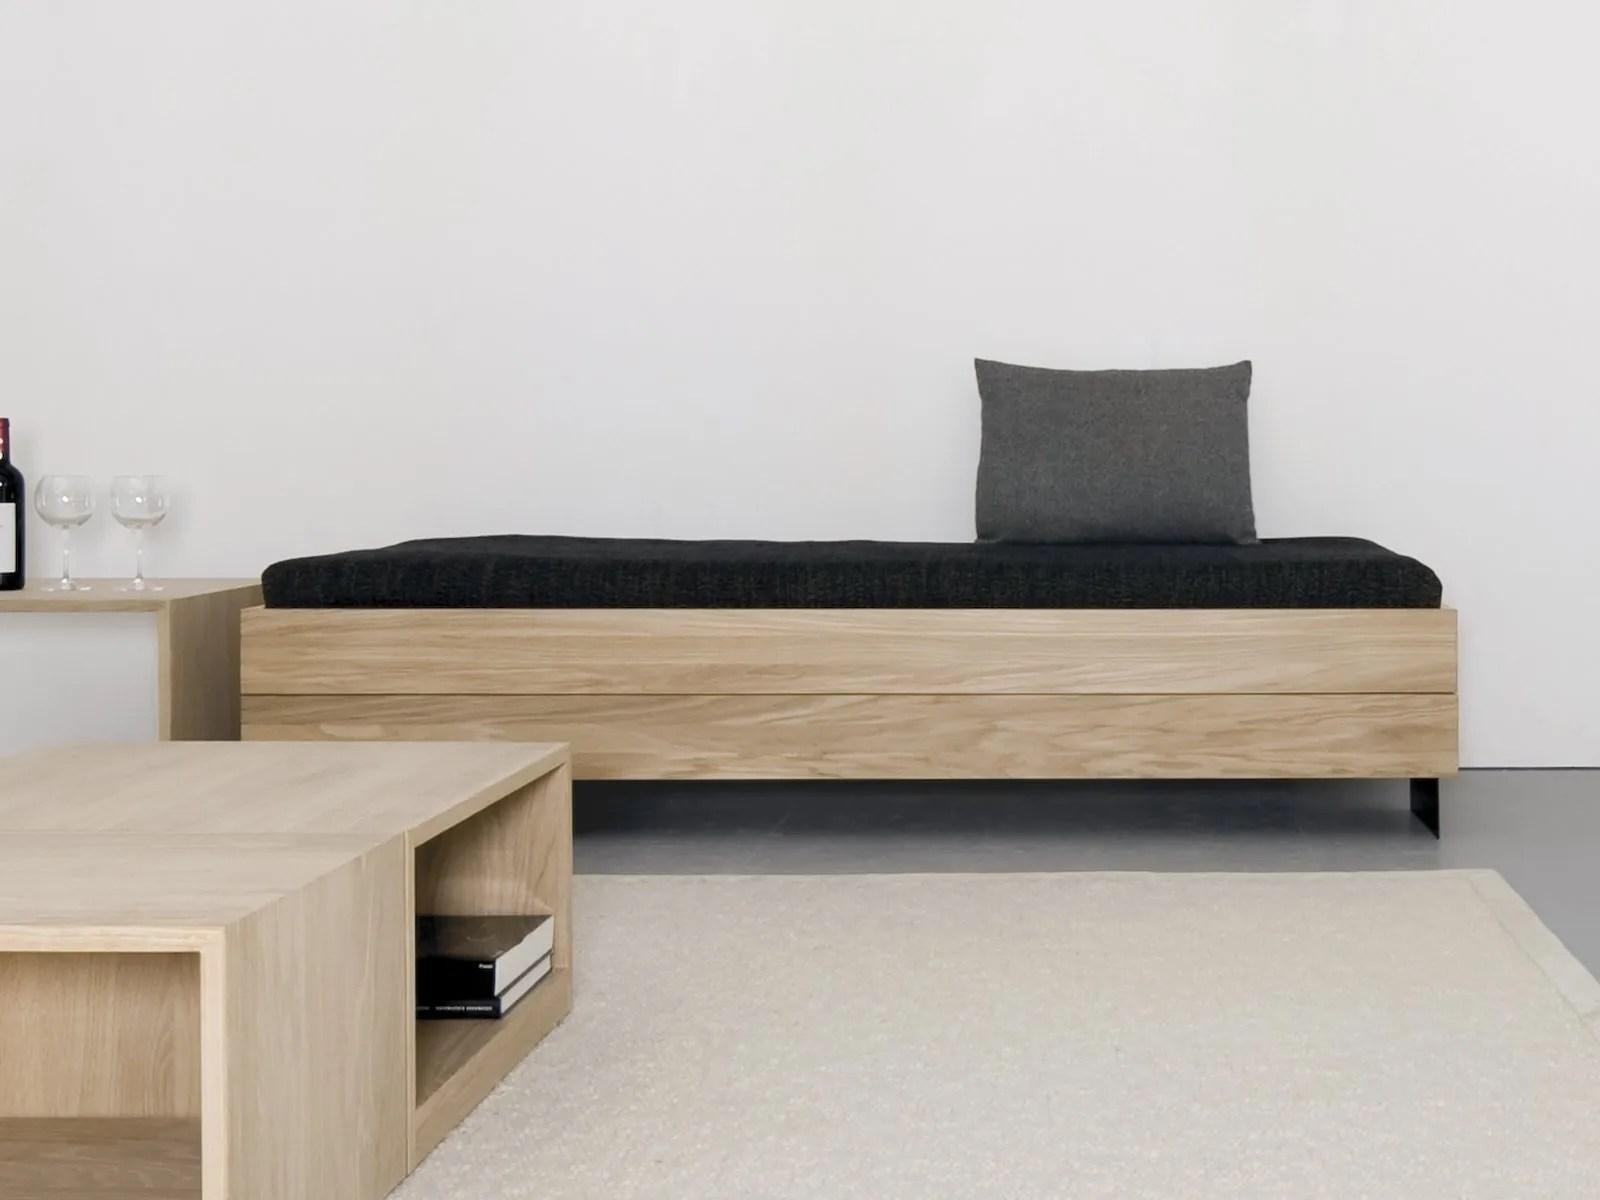 wooden sofa bed learher sofas solid wood iku by sanktjohanser design matthias